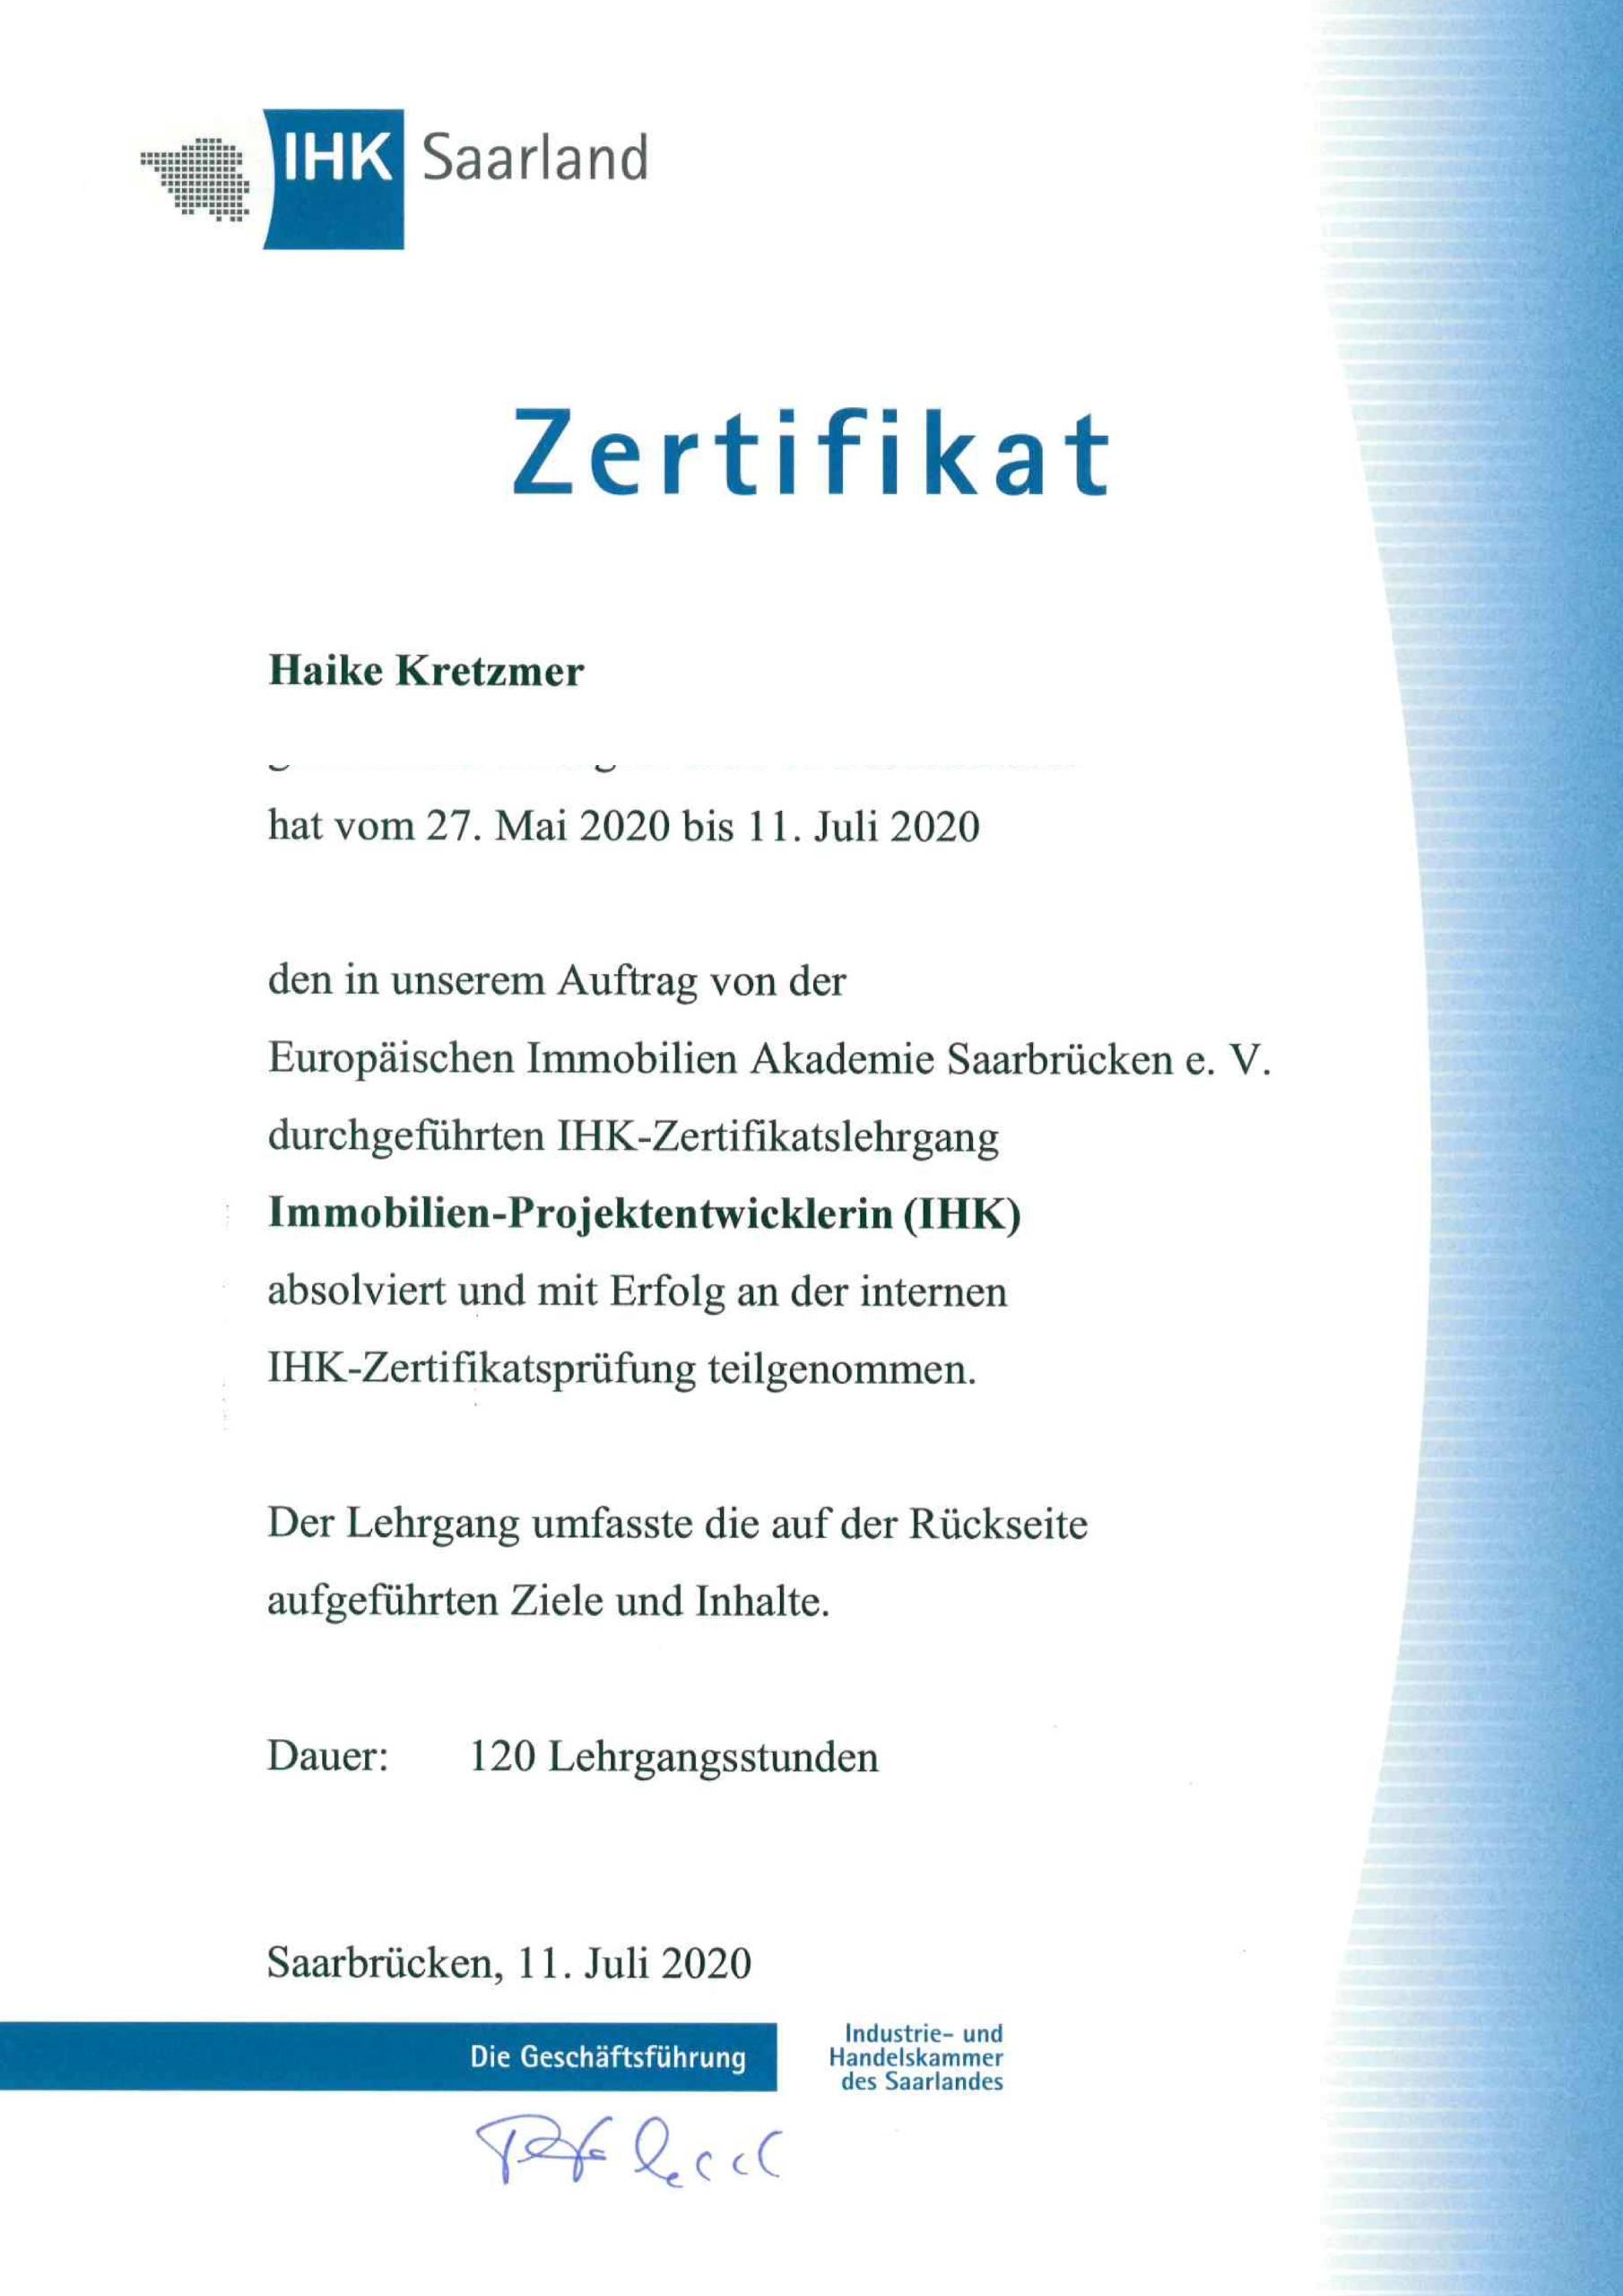 kretzmer_immoprojektentwicklerin_thumb